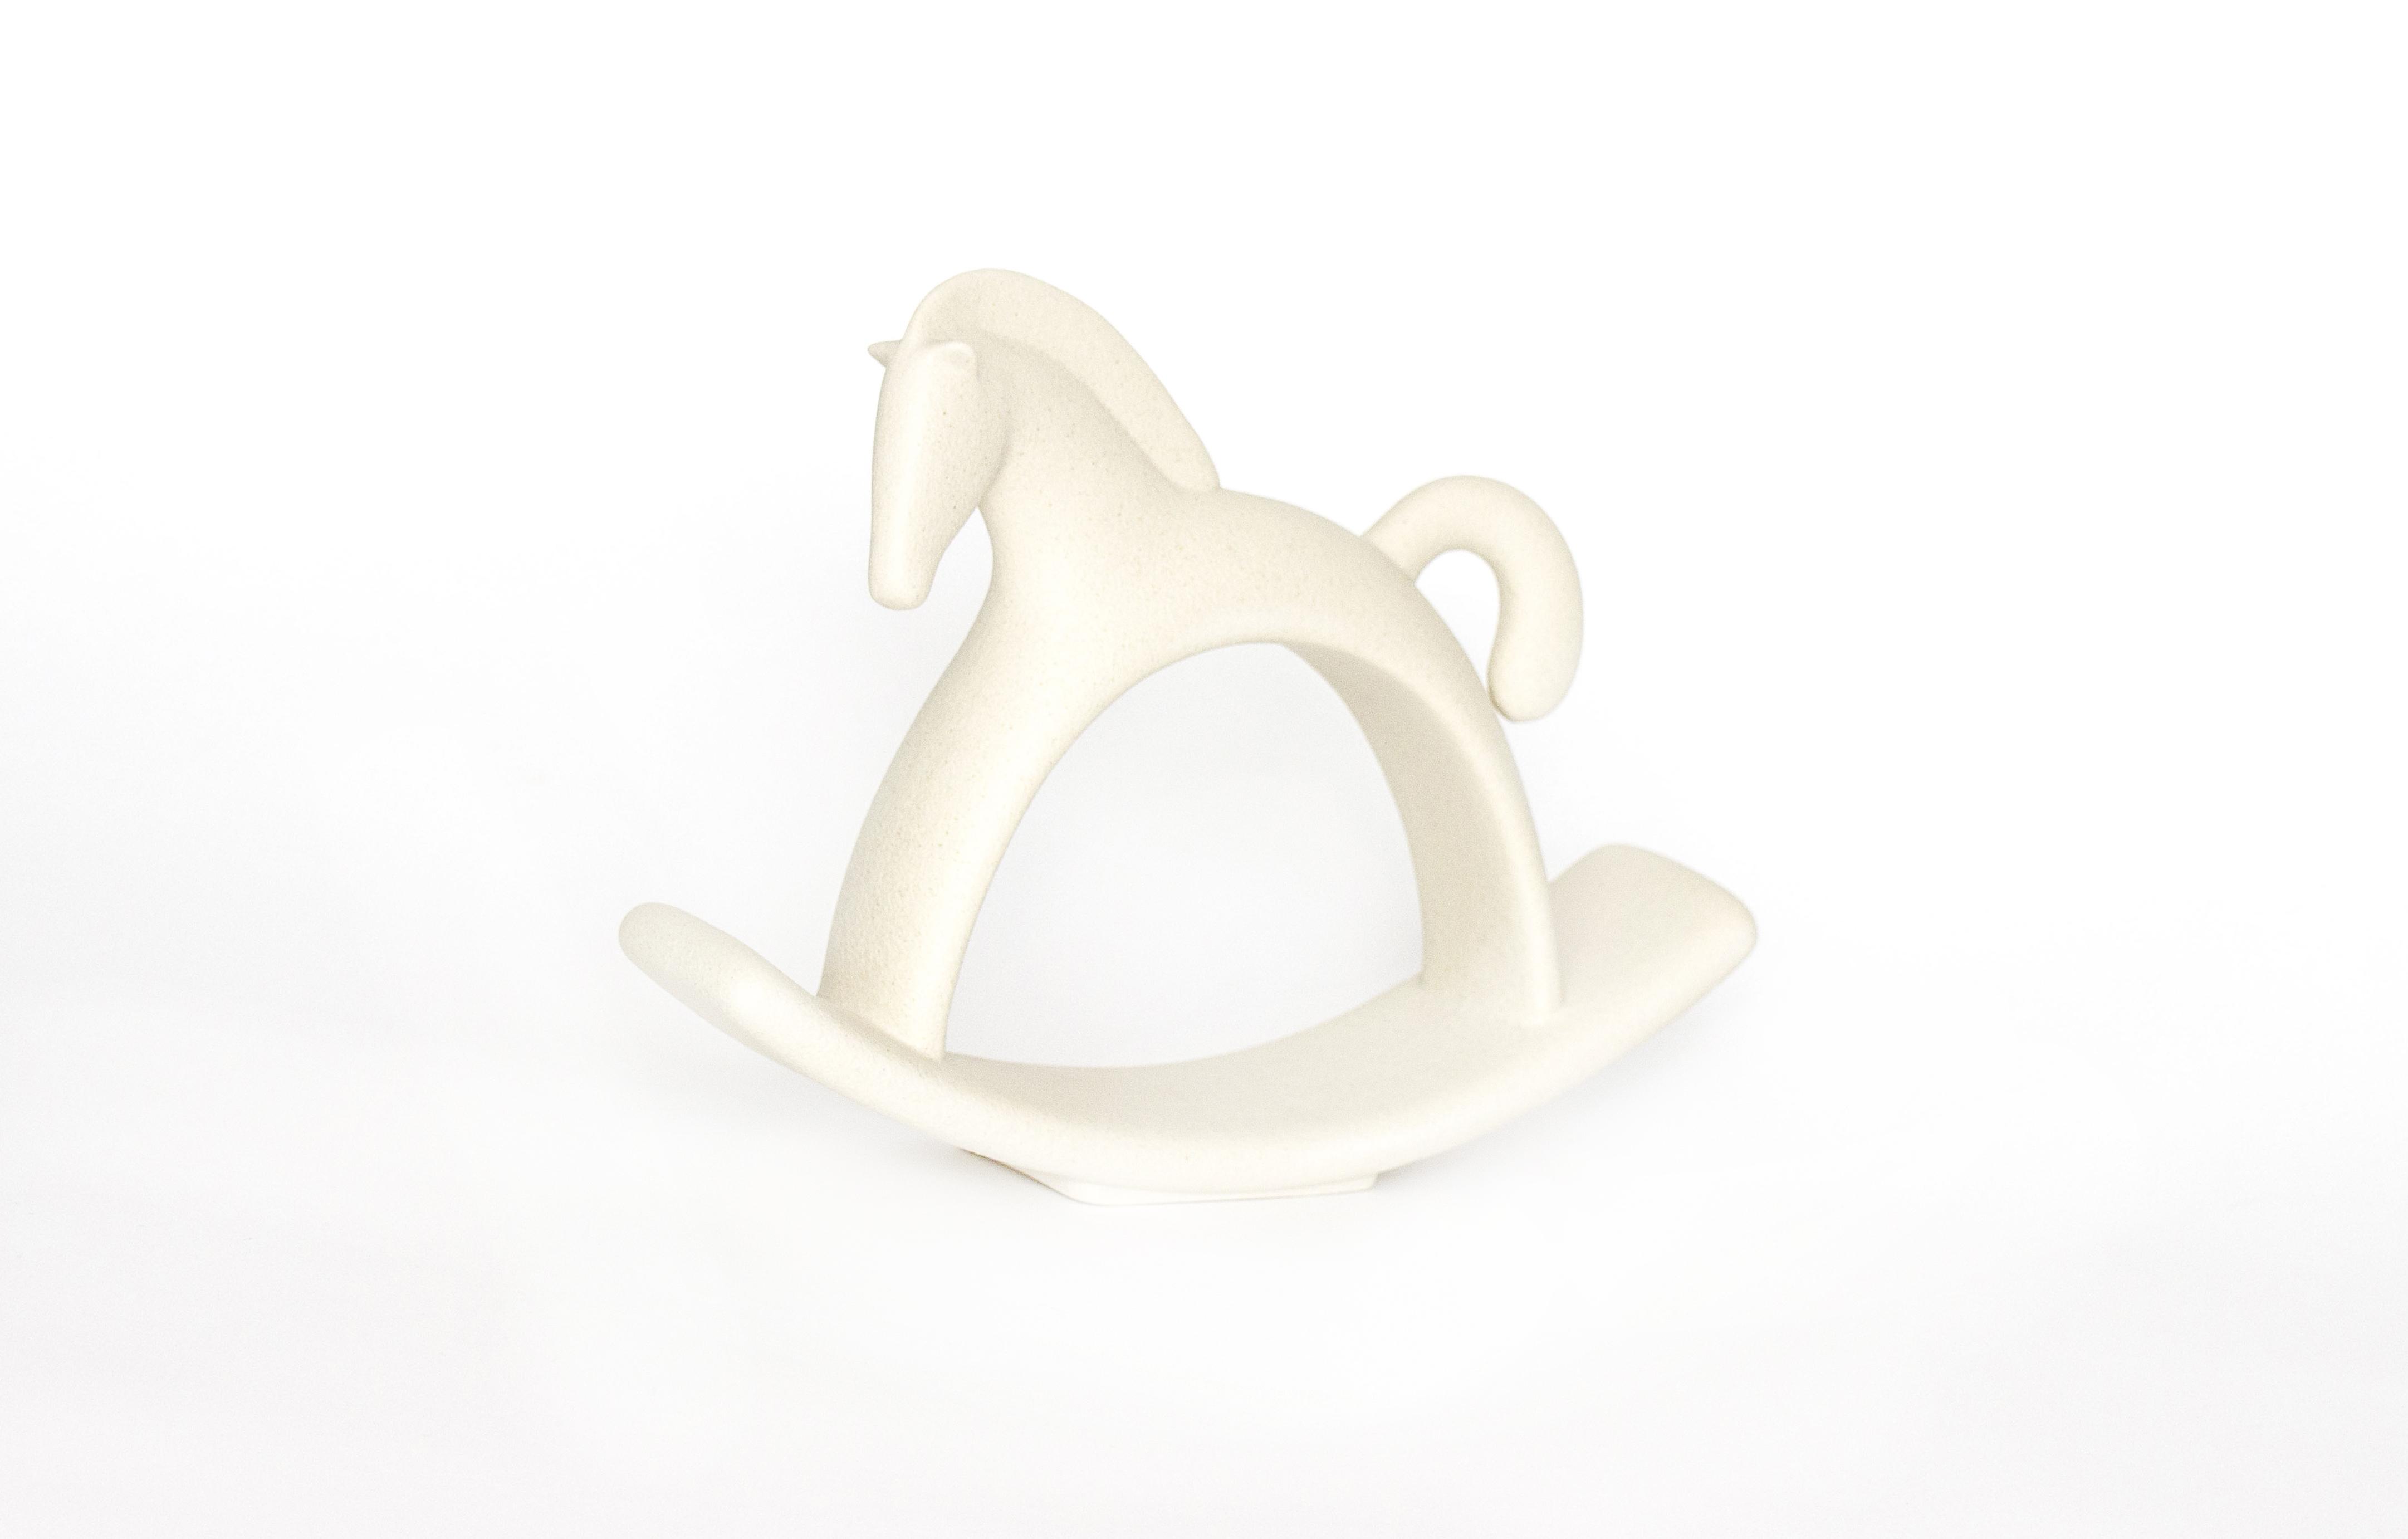 Lineasette Фигура Лошадь-качалка тутси  quot лошадь quot   т коричневая  315 2014